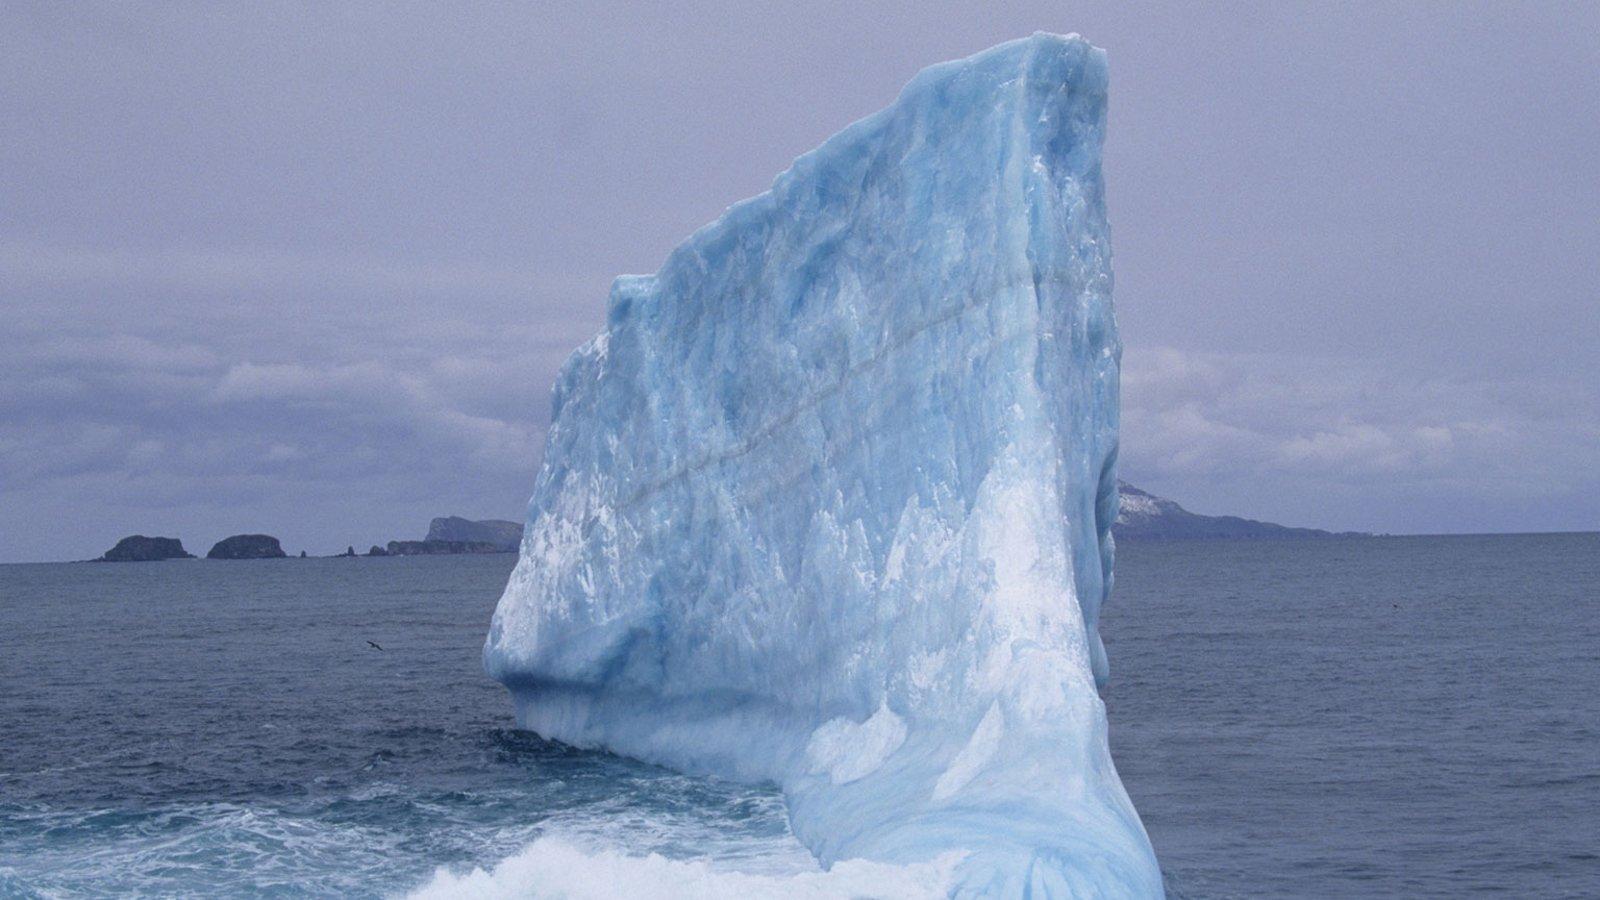 Antarctica—A World of Ice